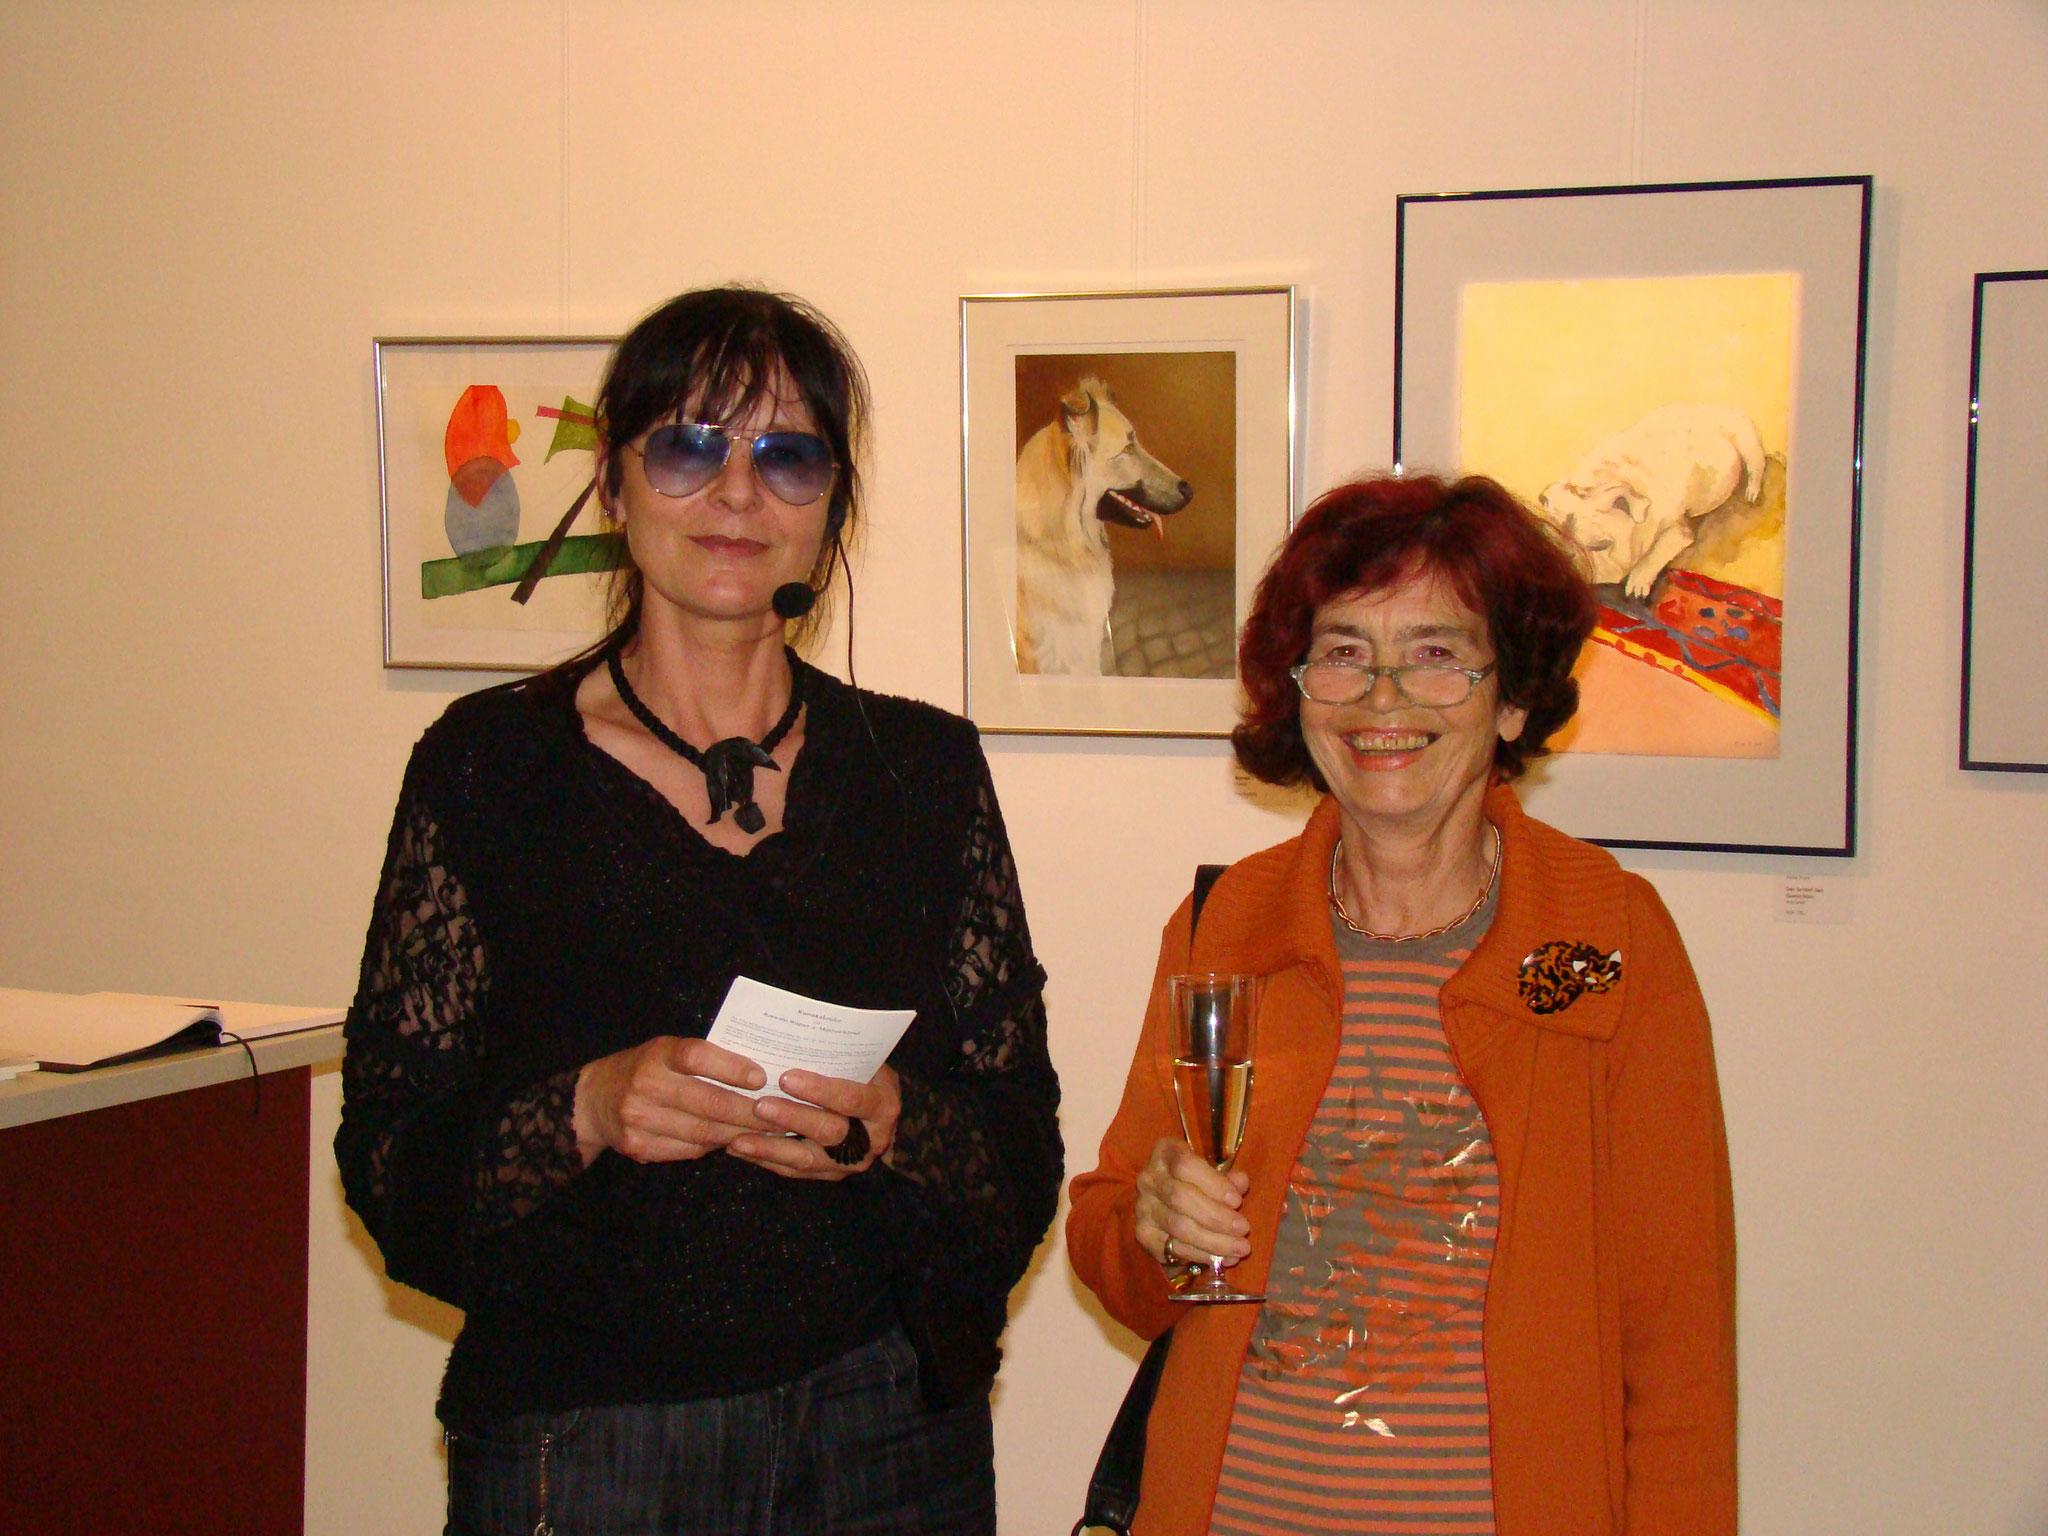 Roswitha Wagner & Leonore Rambosek